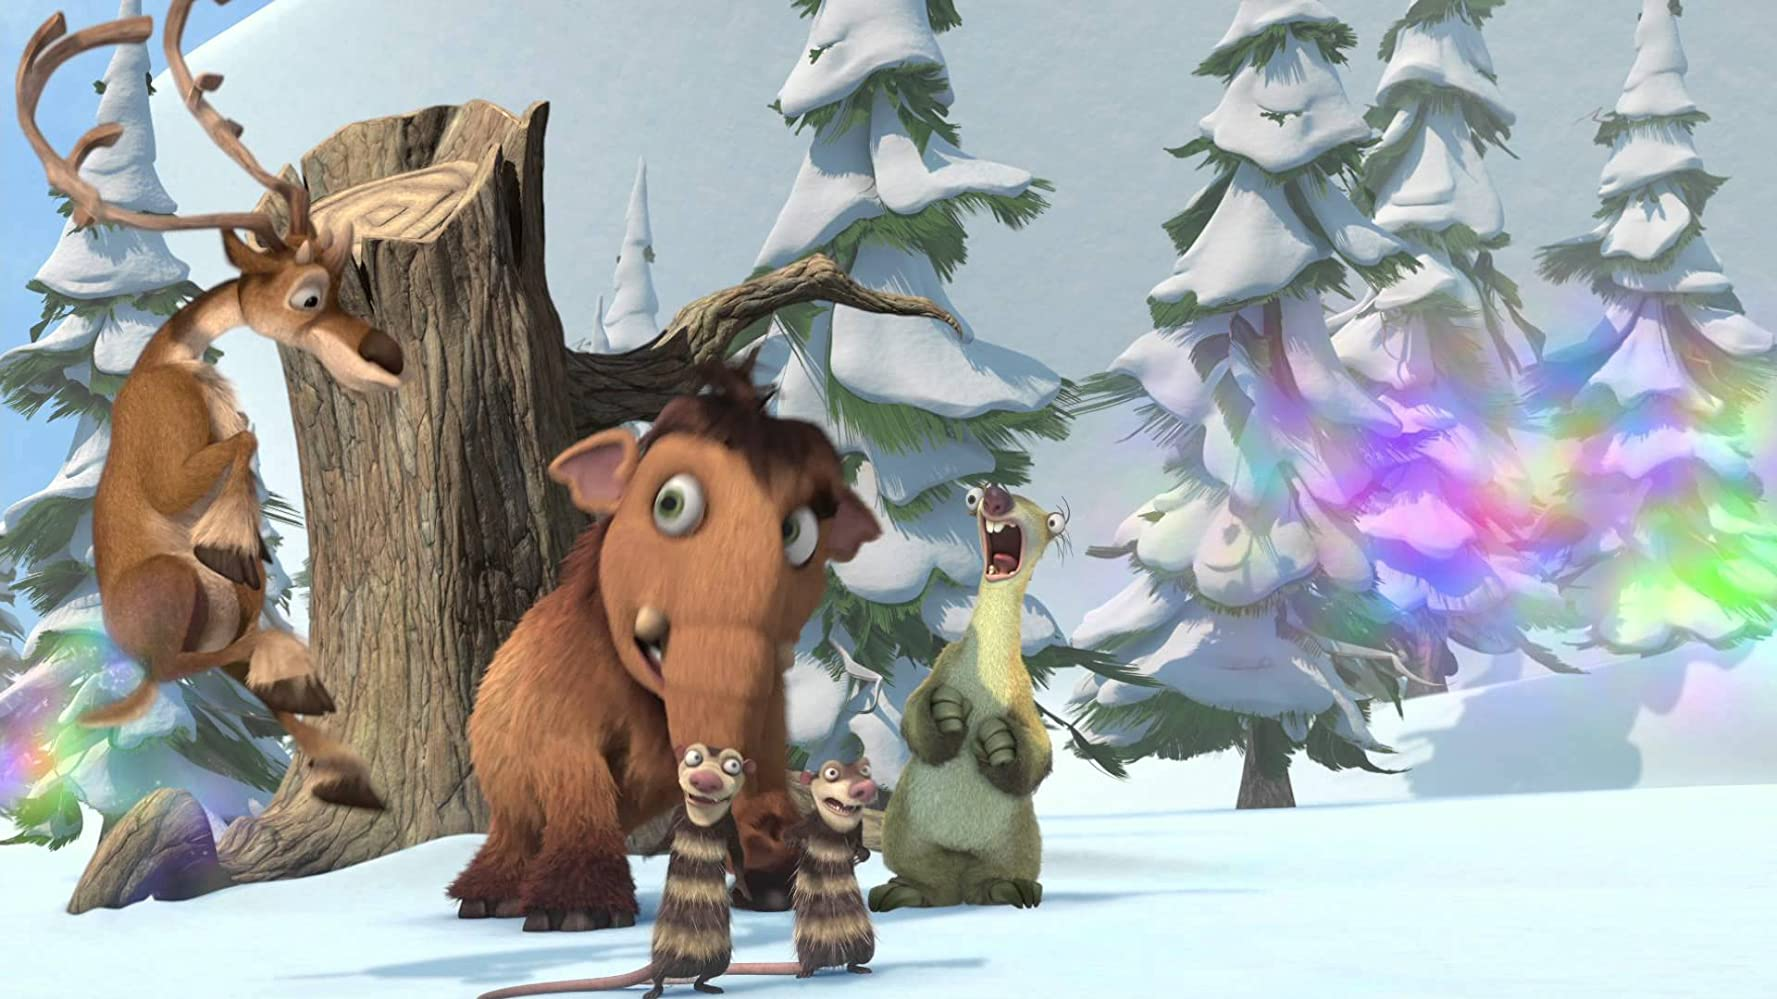 Ice Age A Mammoth Christmas (2011)